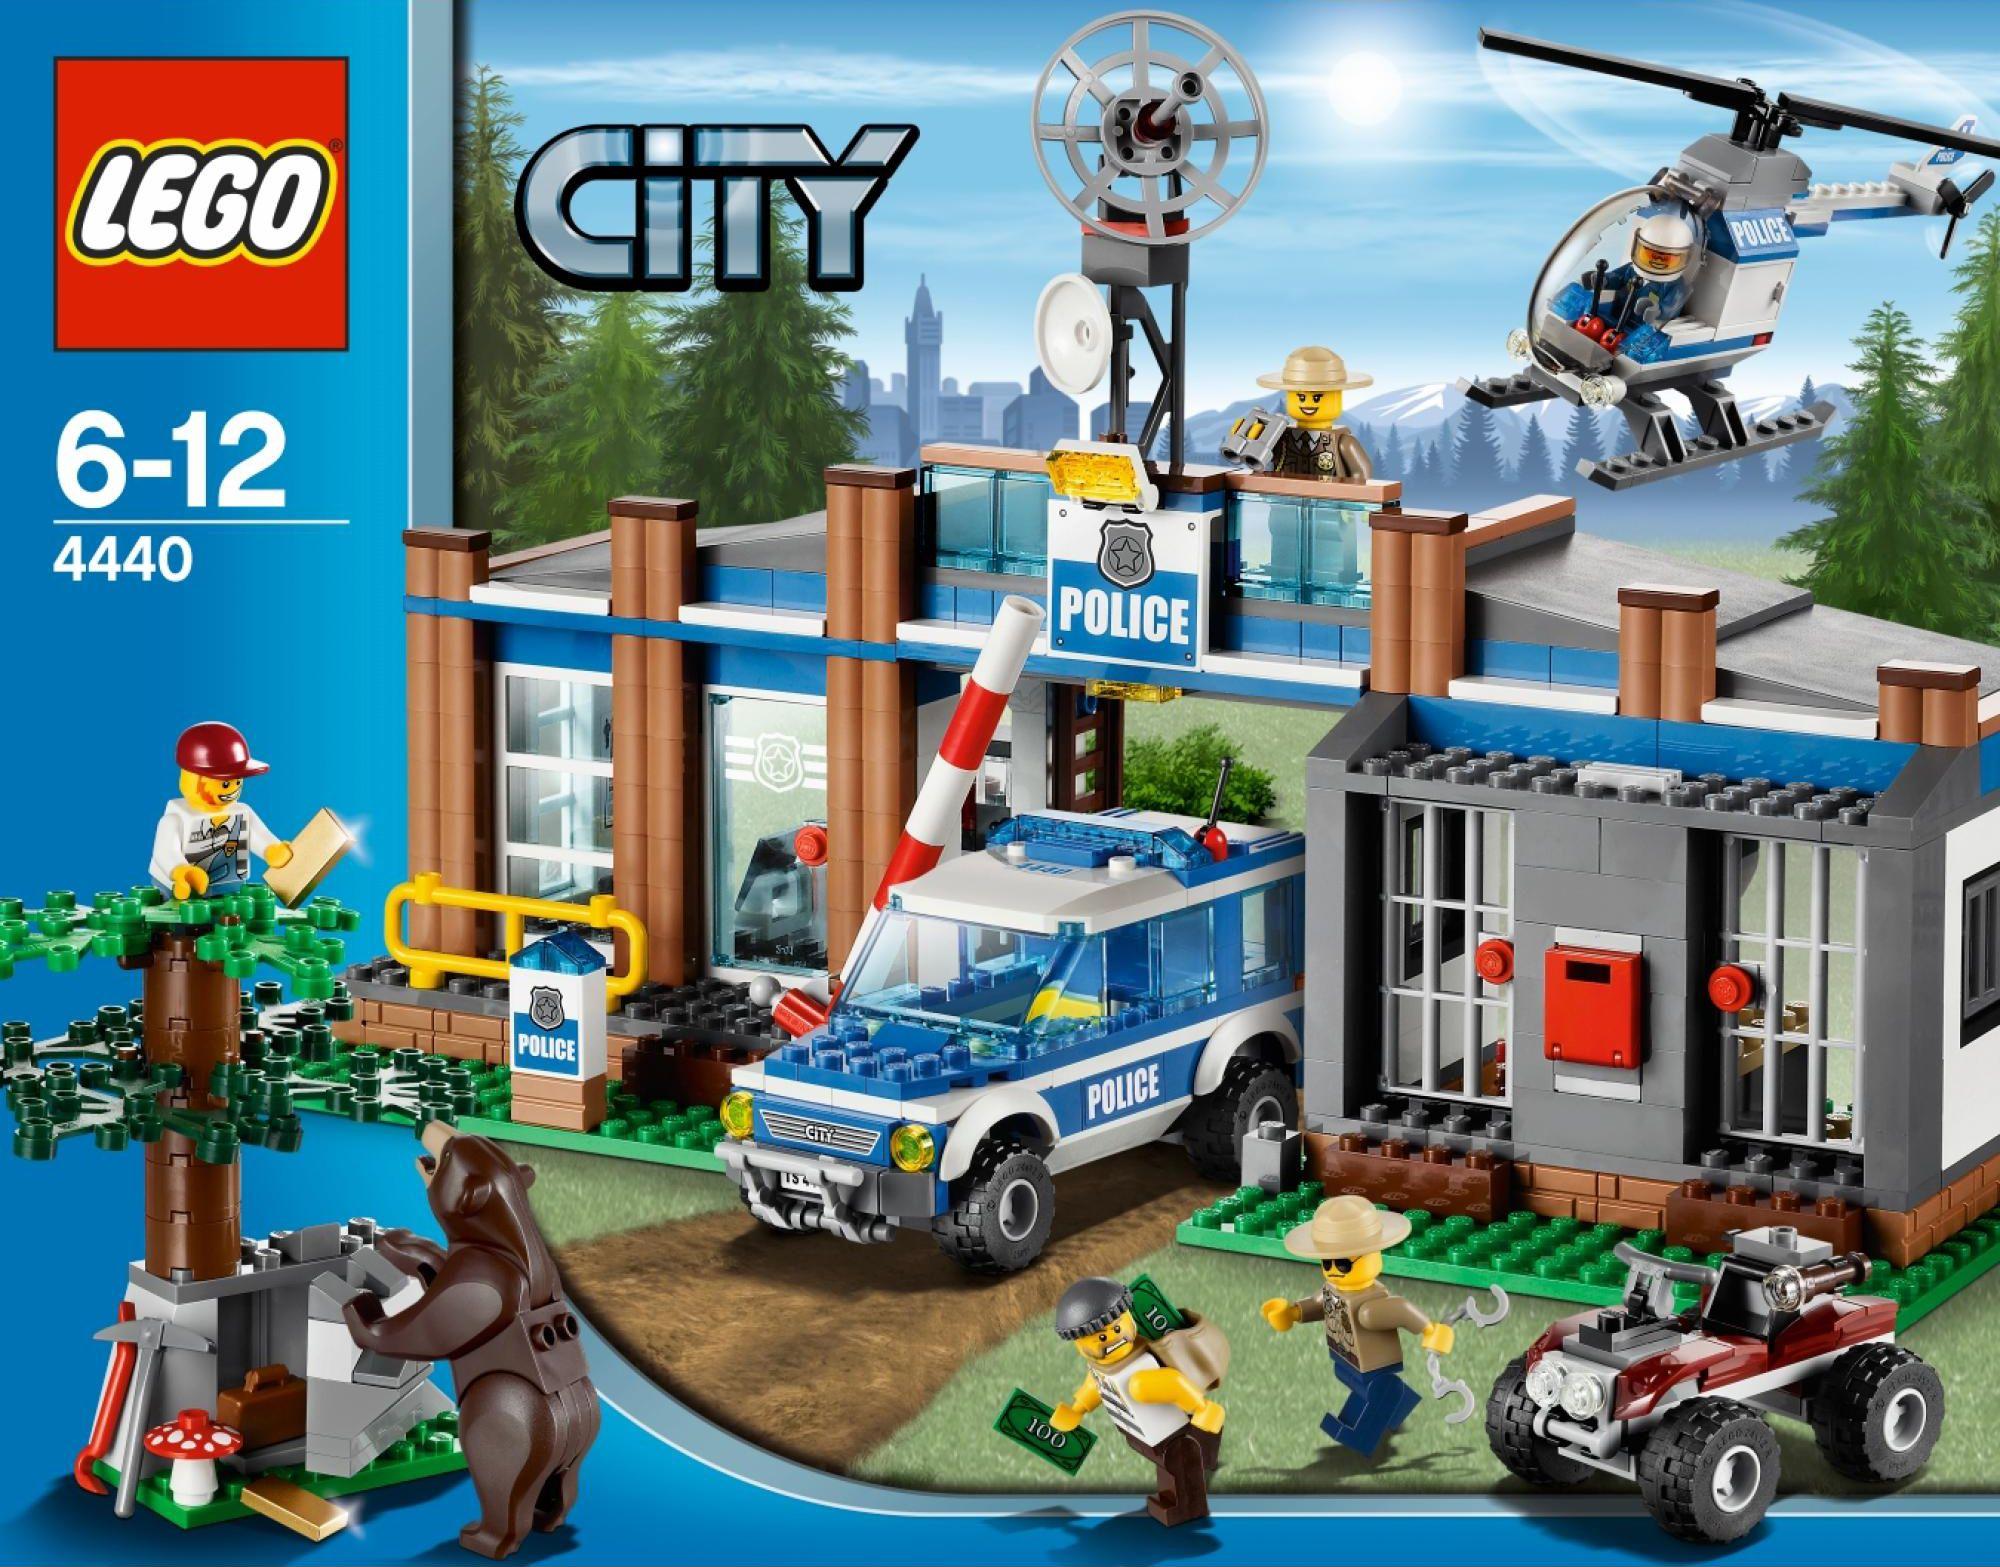 New Lego City Sets For 2012 Bears Hillbillies Lego City Police Station Lego City Sets Lego City Police